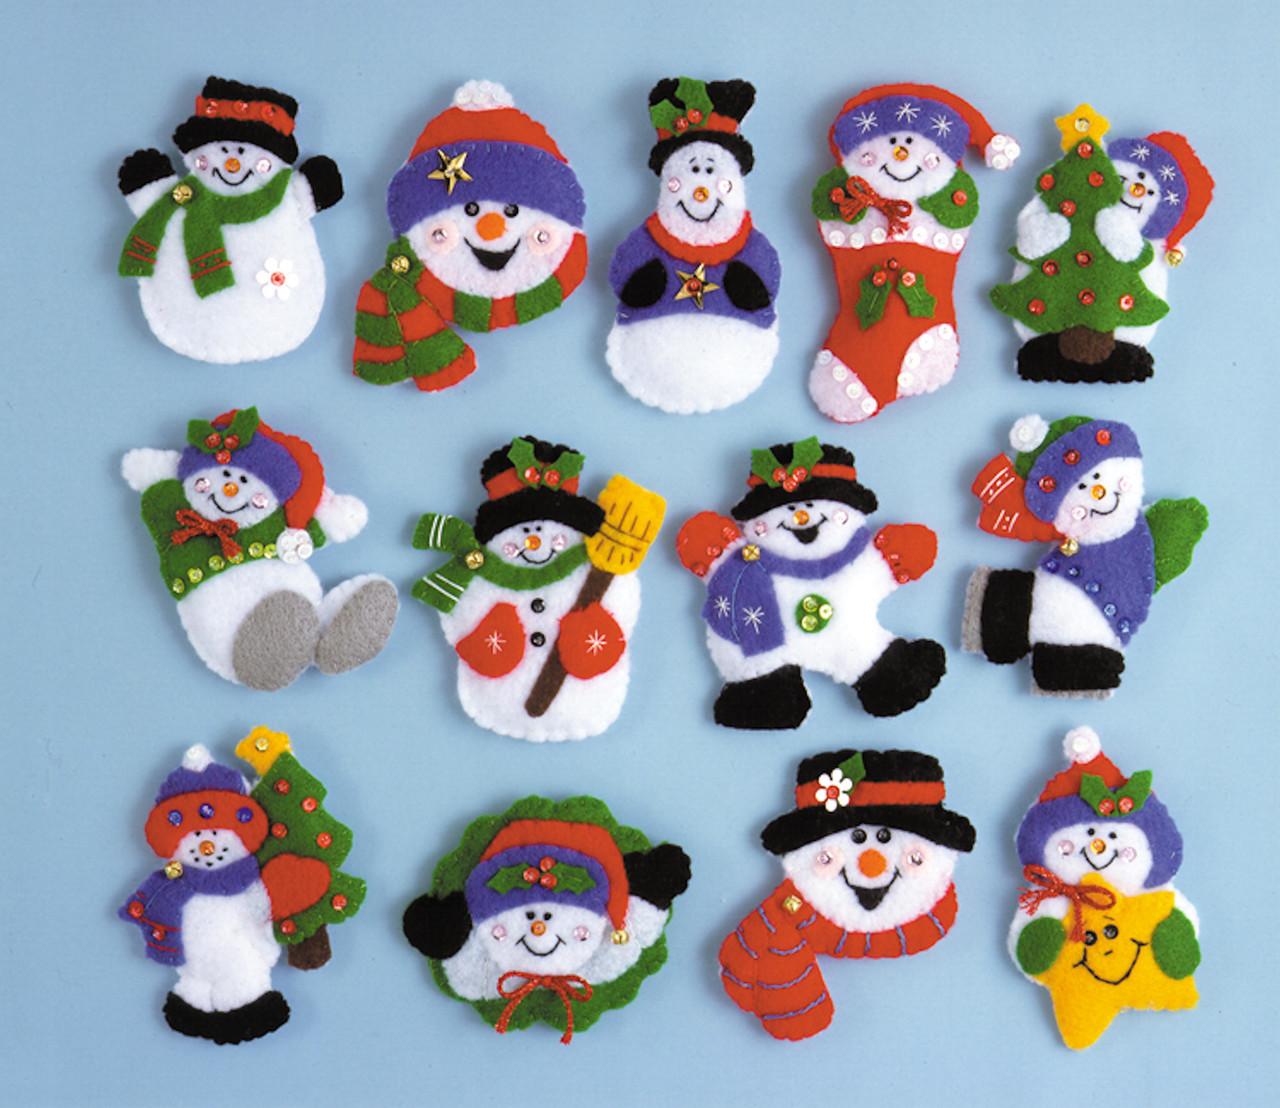 Design Works - Lotsa Fun - 13 Snowman Ornaments